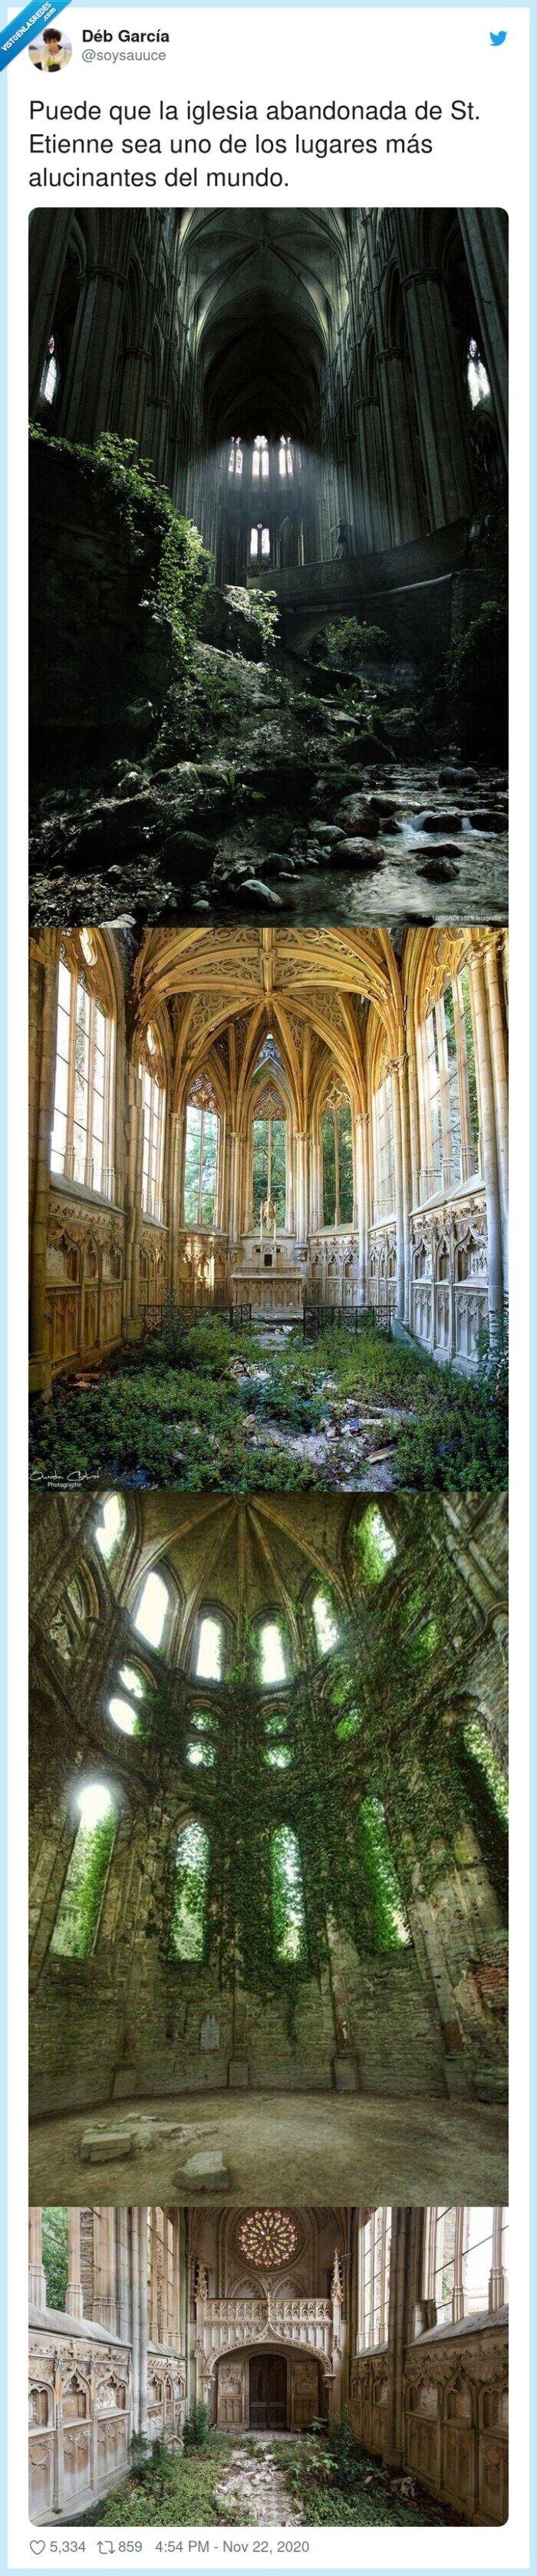 abandonada,etienne,iglesia,lugares